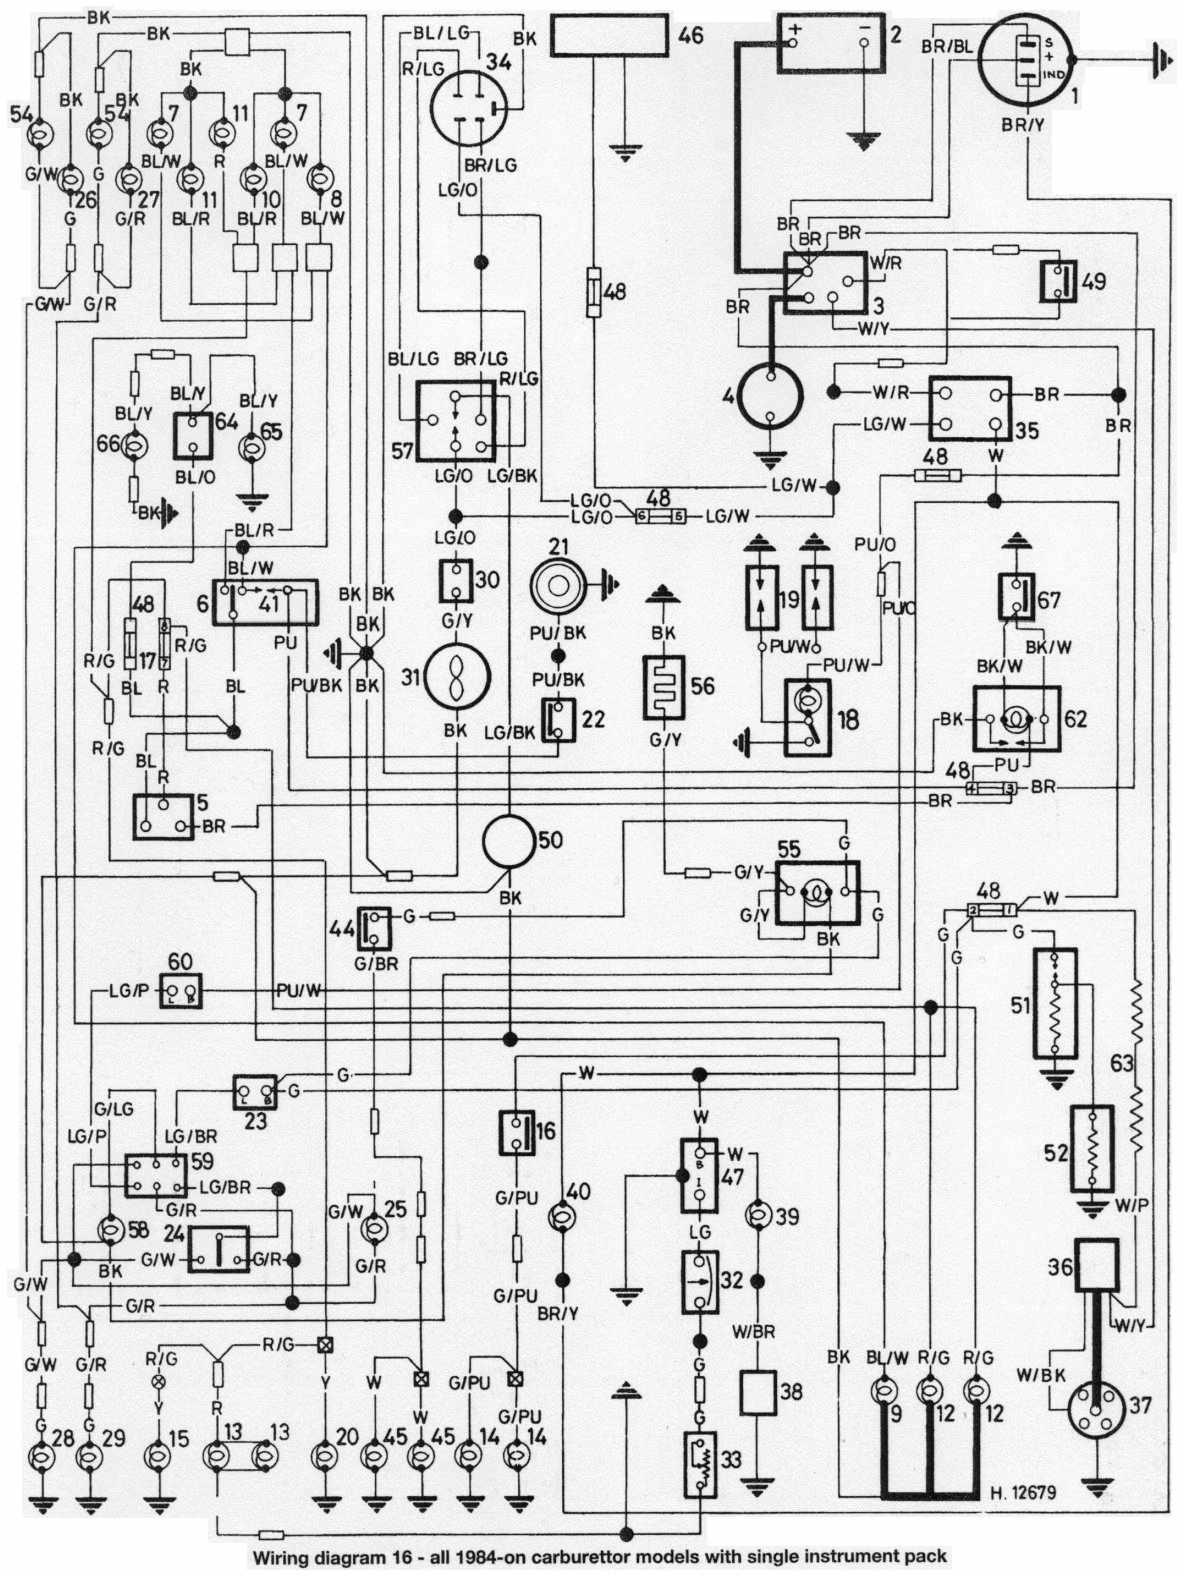 1985 Austin Mini Wiring Diagram  Wiring Diagram